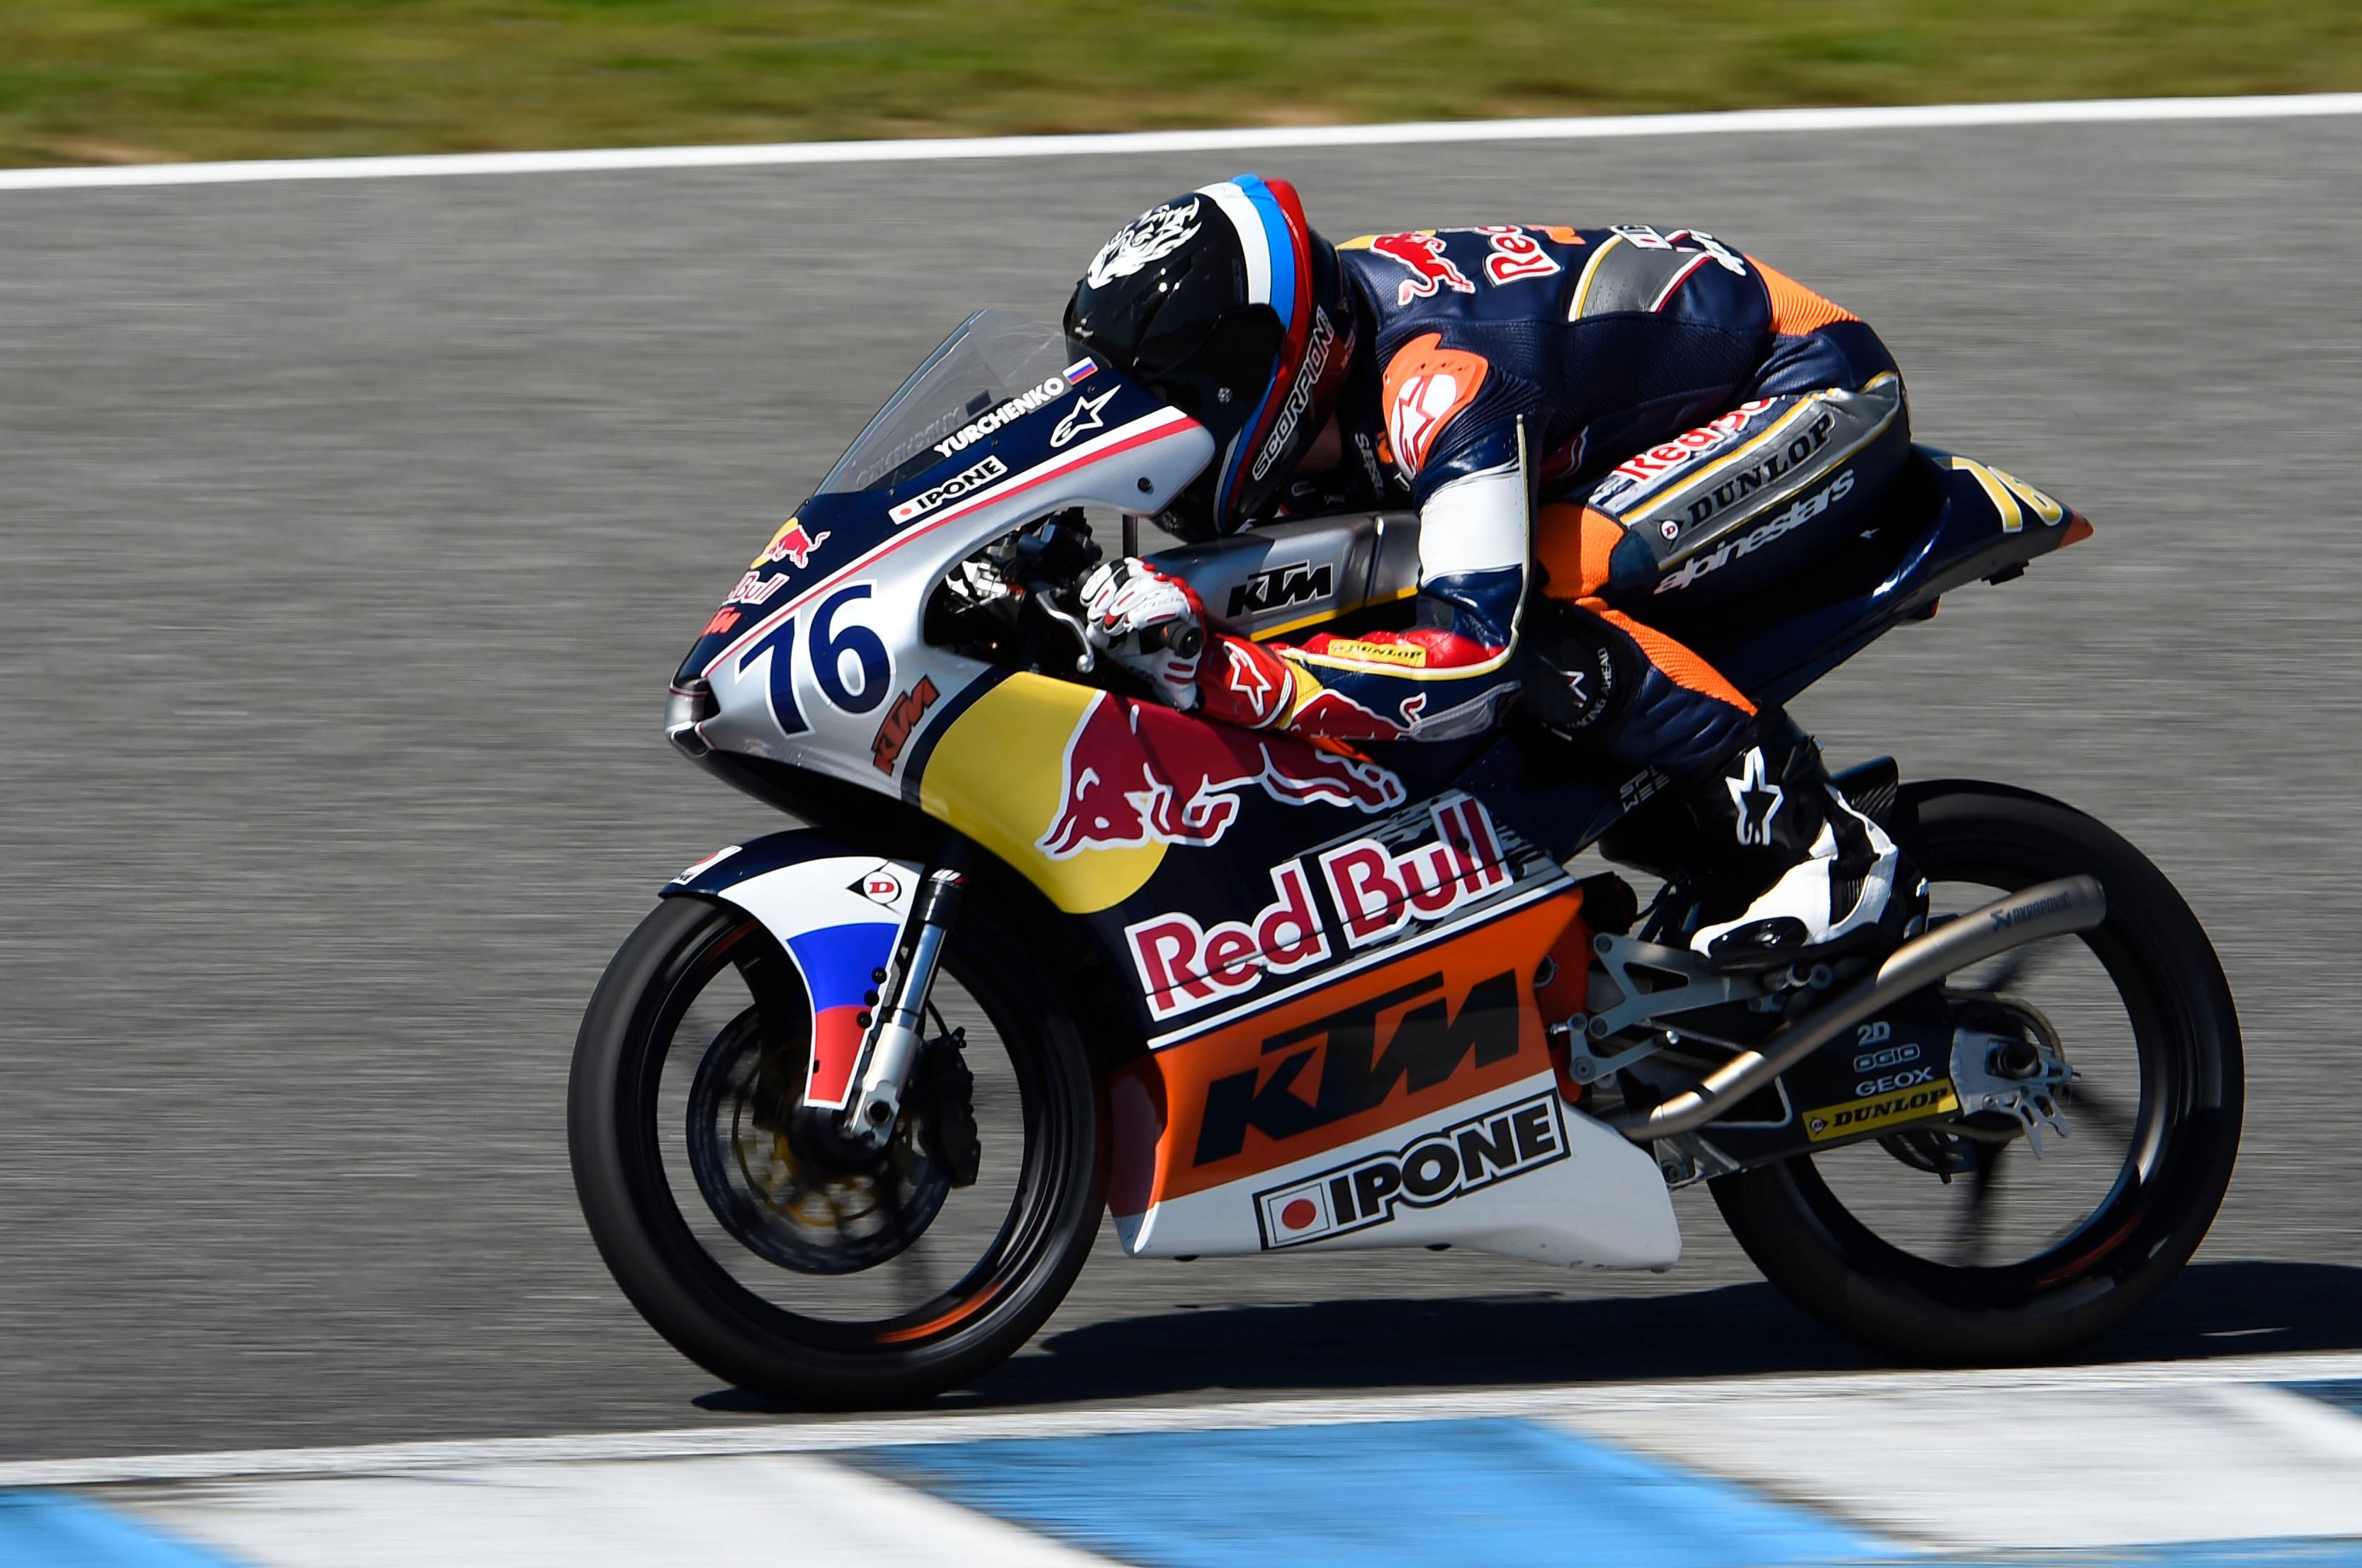 Makar Yurchenko Russia Red Bull MotoGP Rookies Cup 2015 16